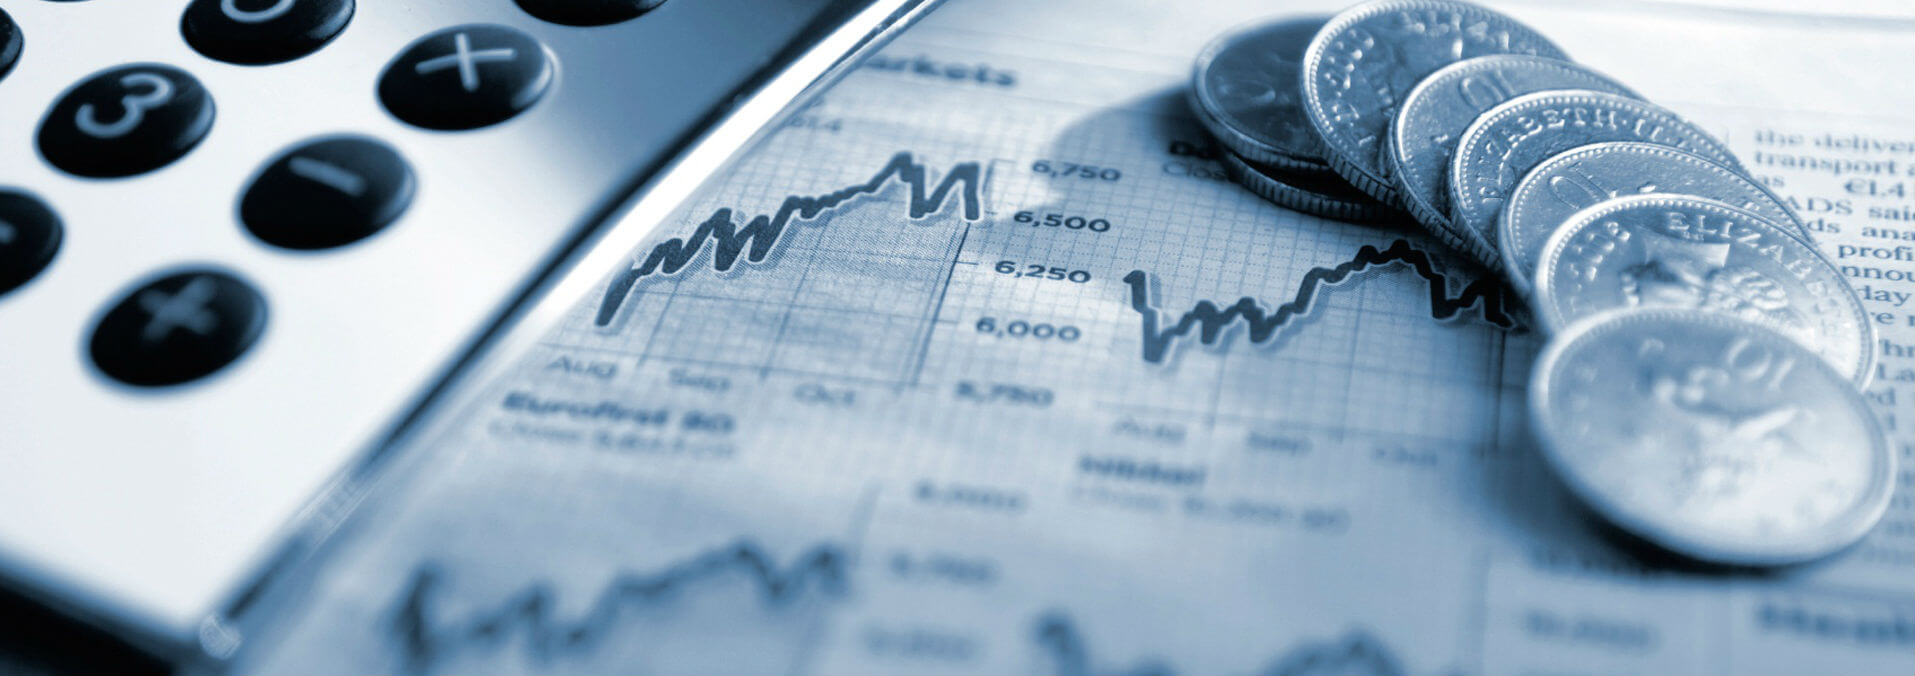 consultoria financeira santos e associados